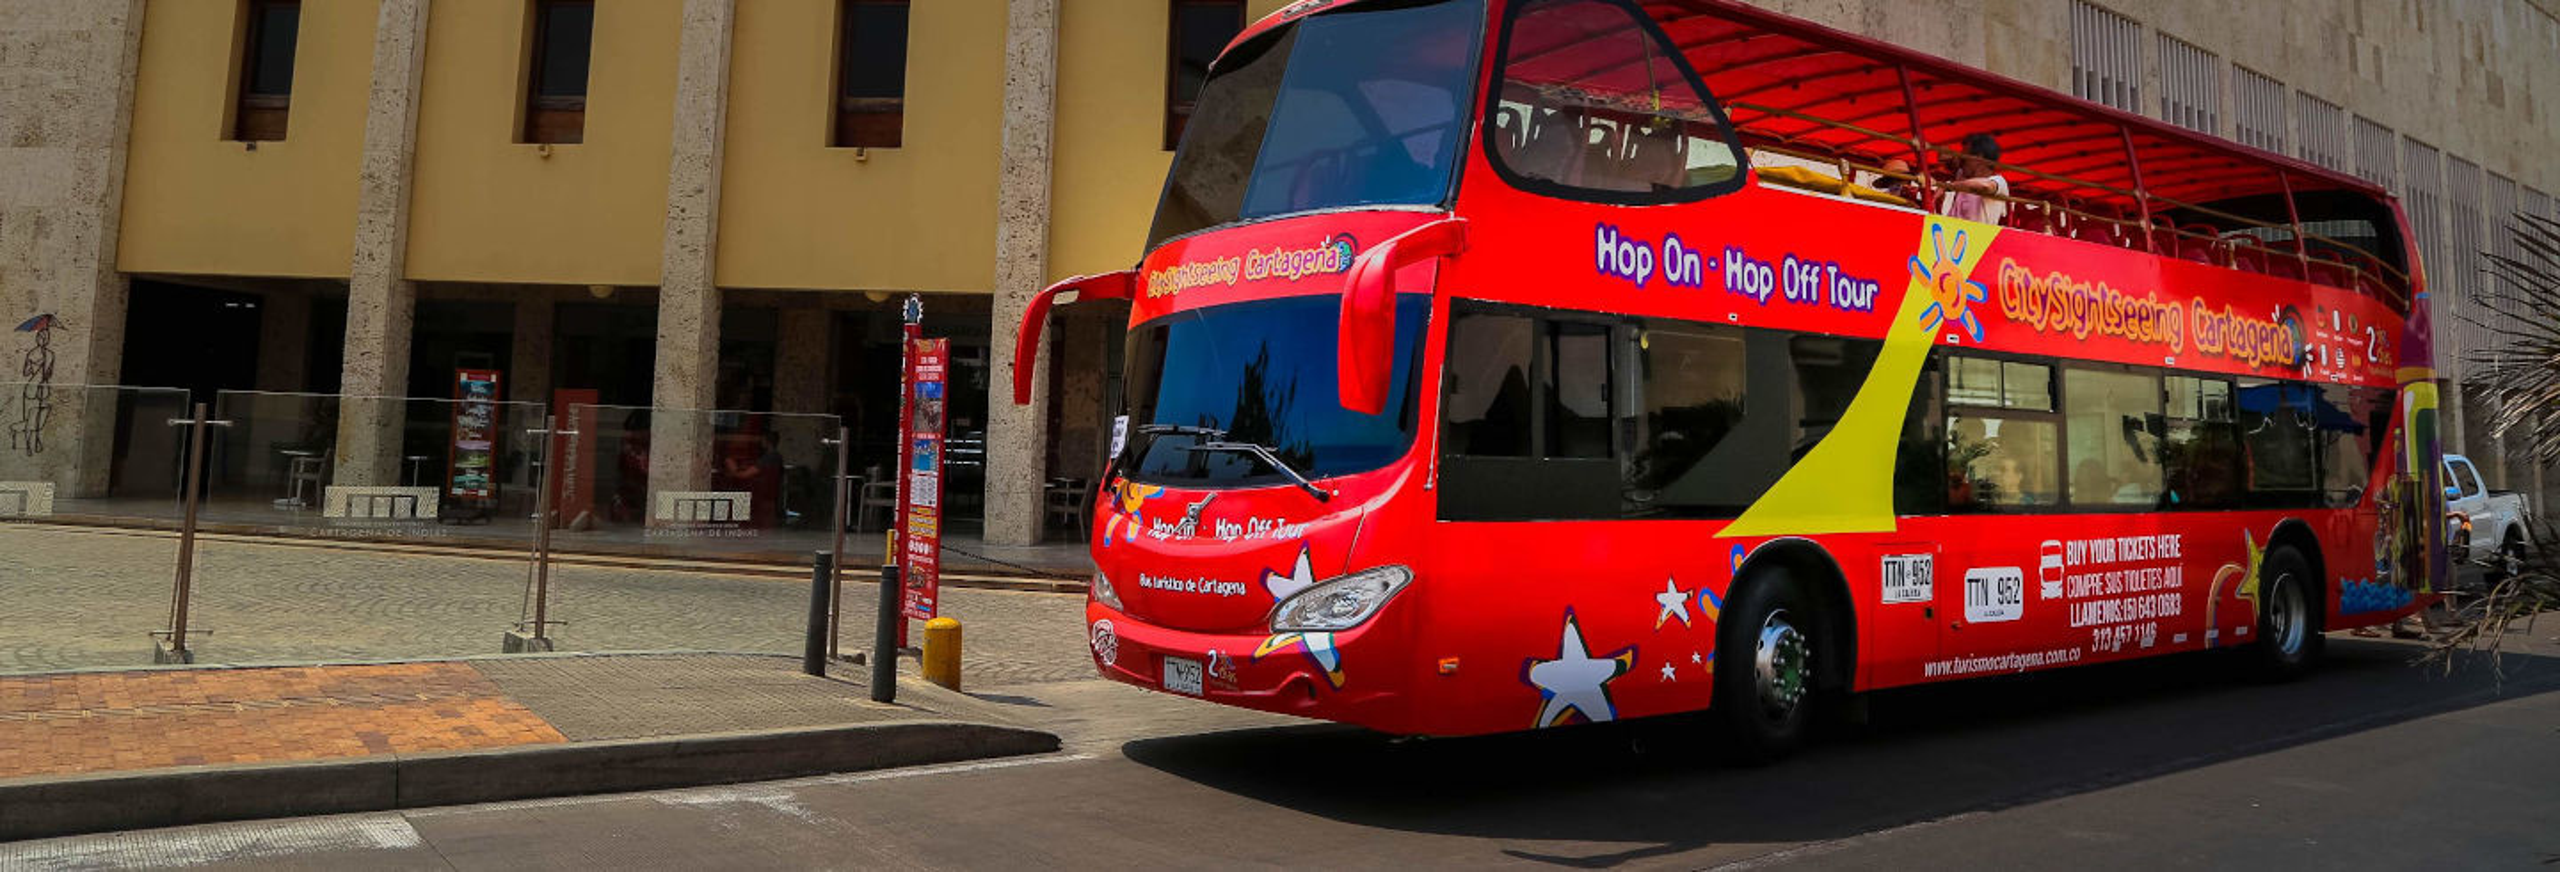 Cartagena Tourist Bus